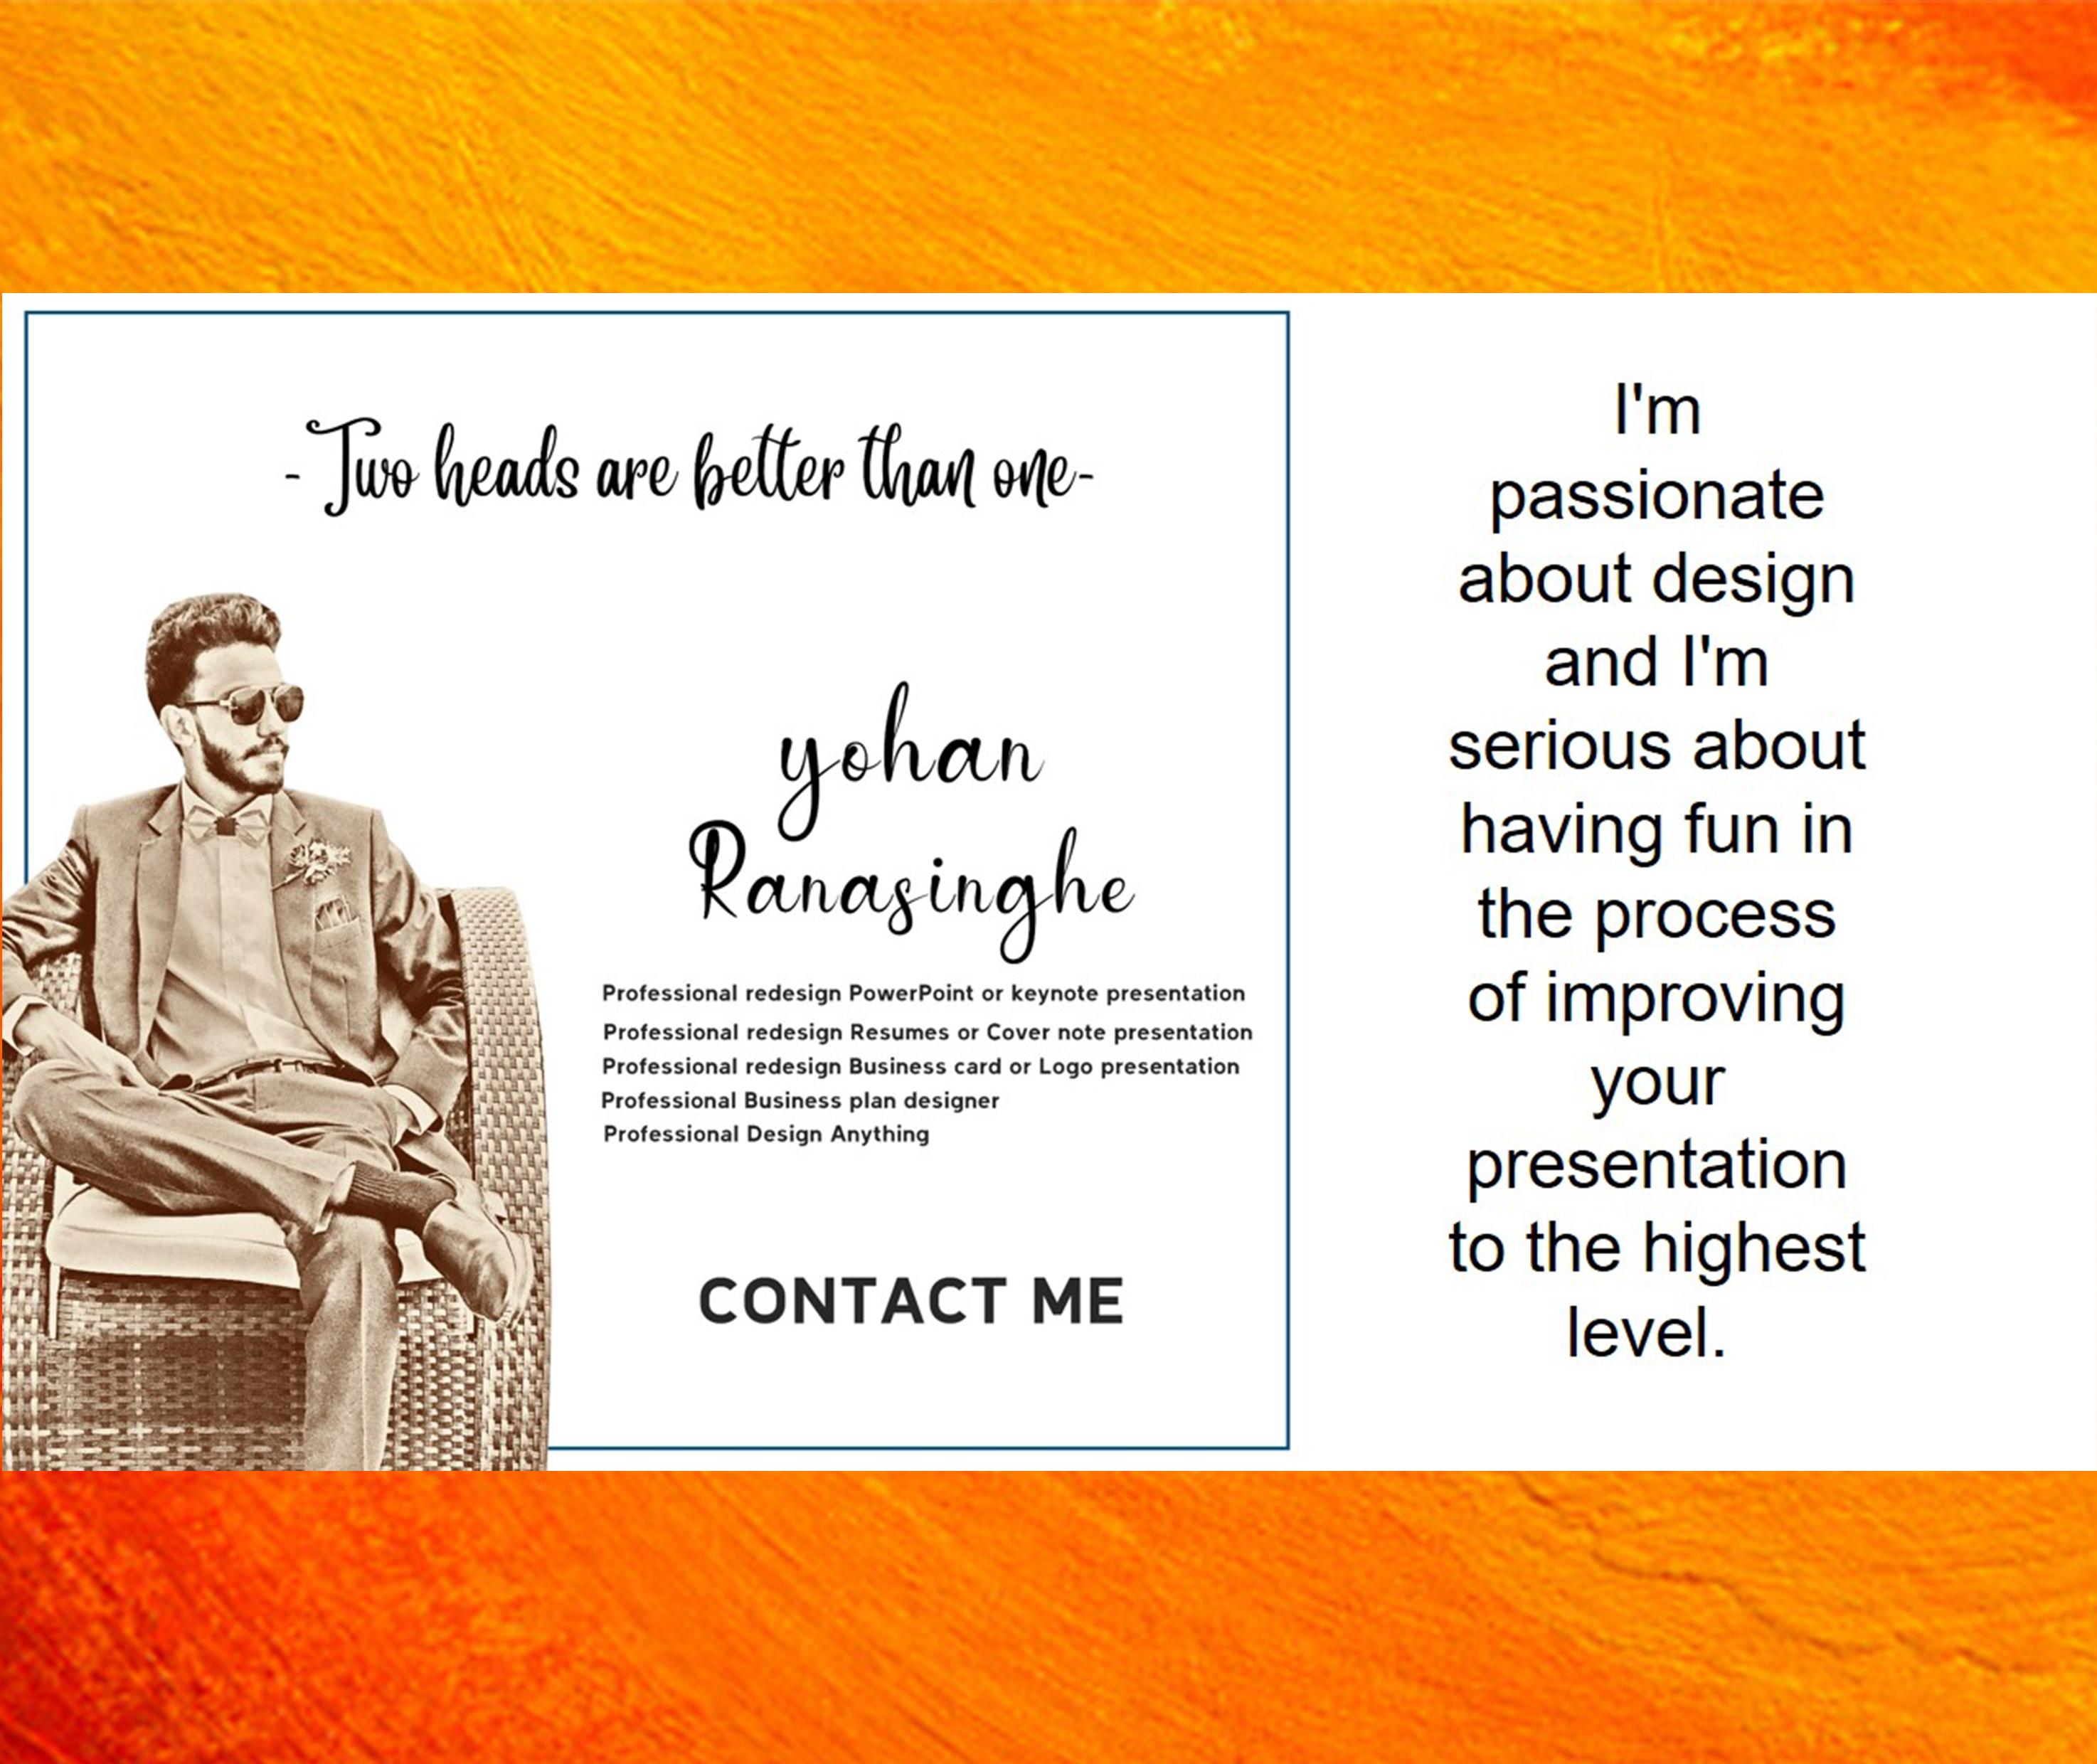 Design PowerPoint or keynote presentation